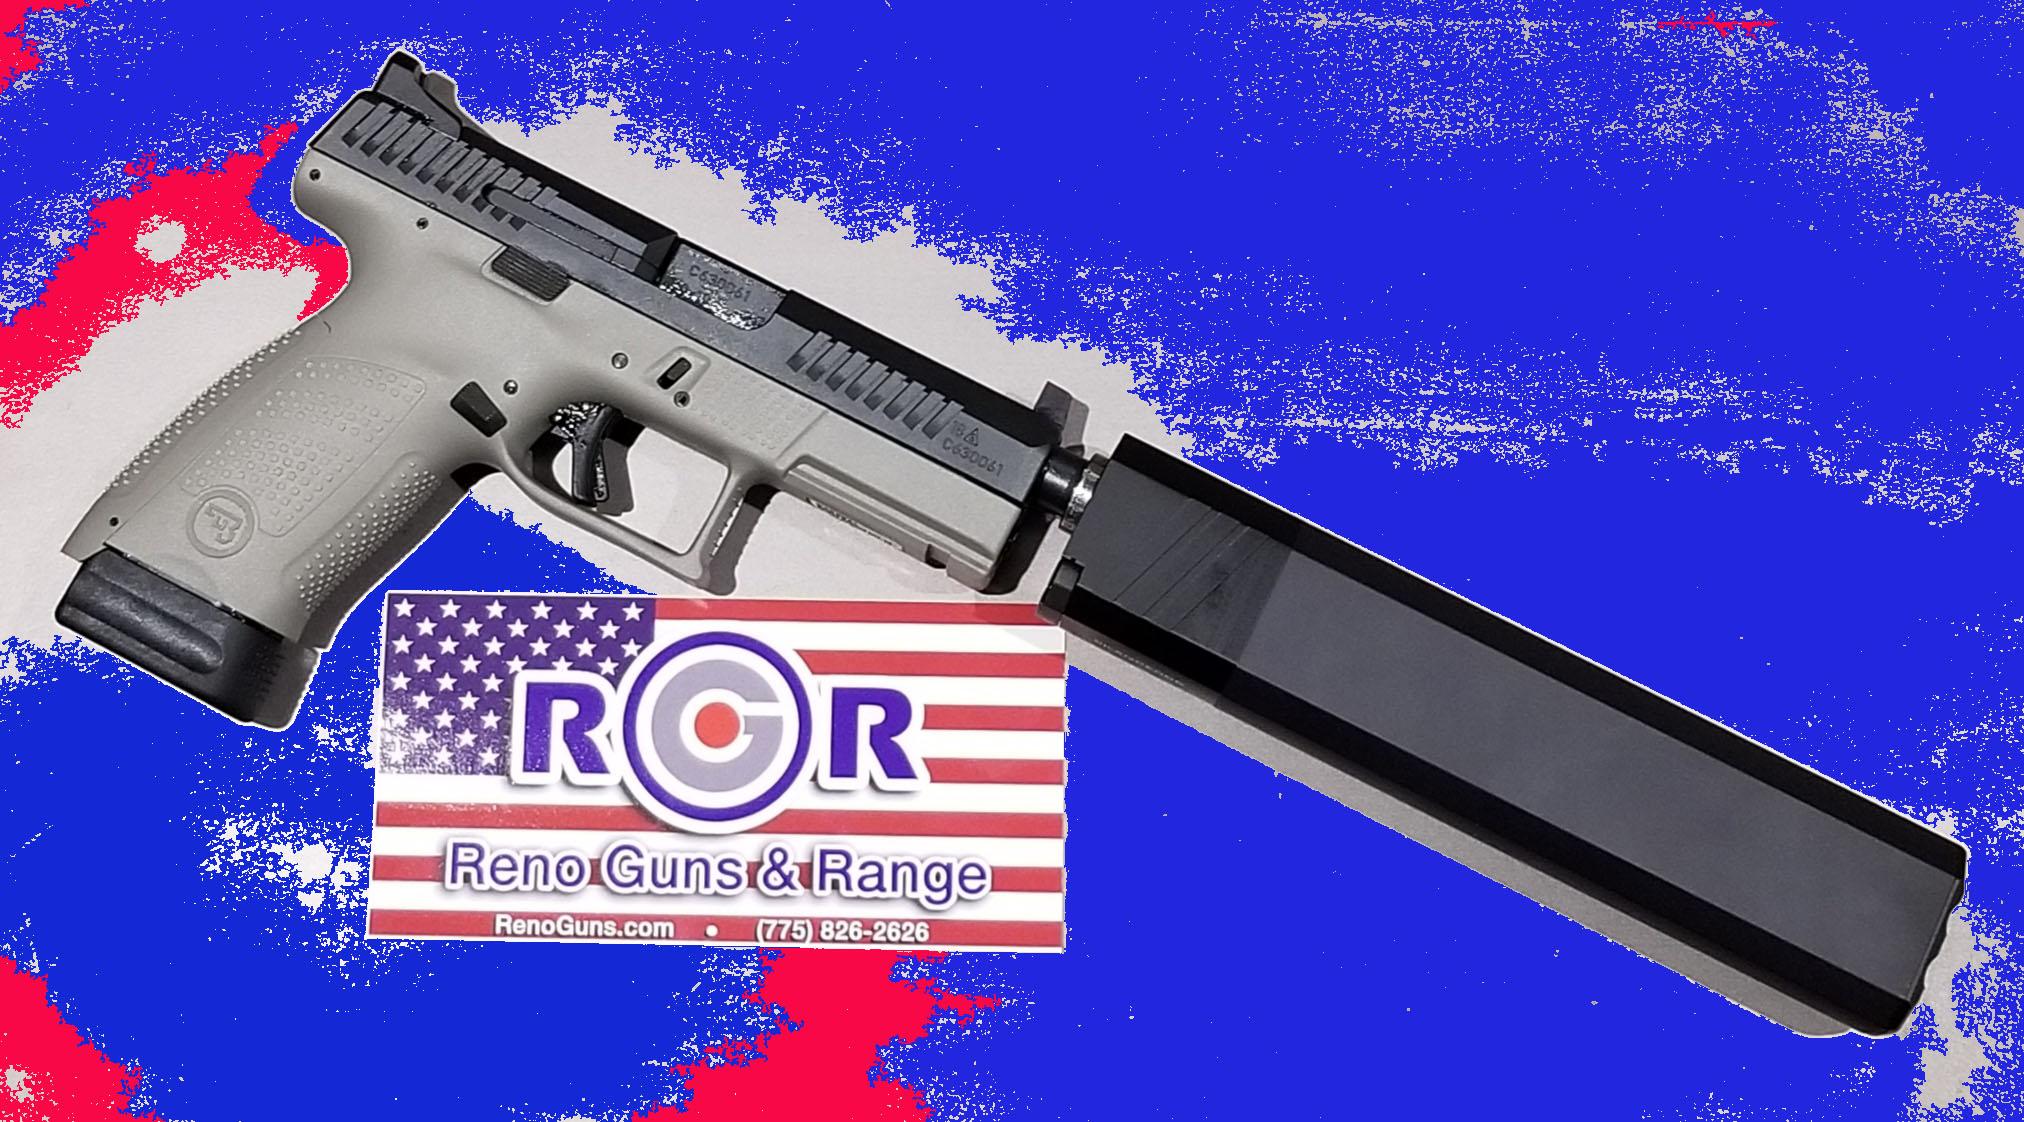 Staff, Author at Reno Guns & Range